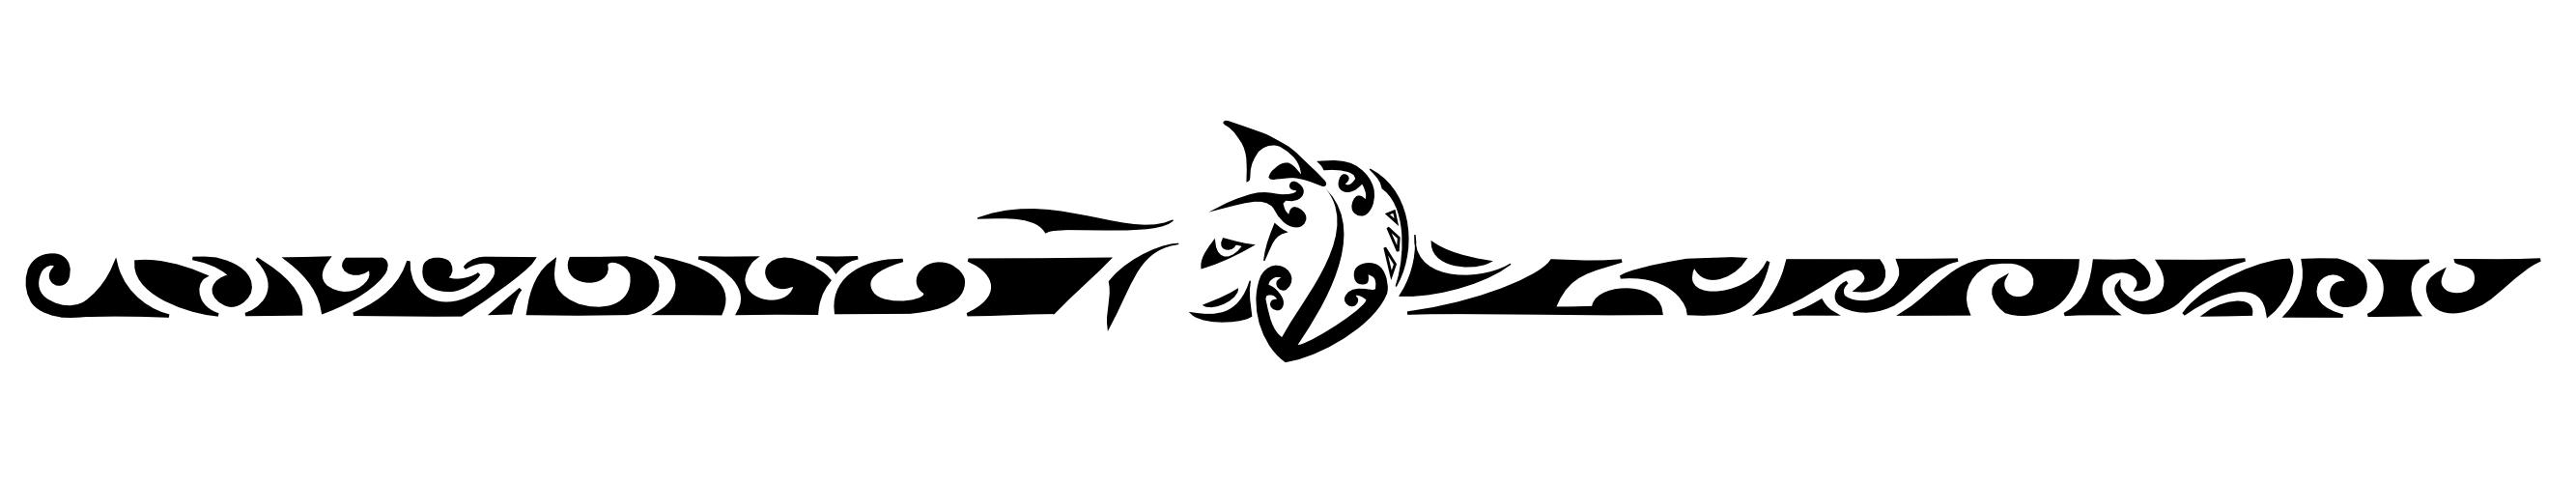 Samoan Armband Tattoo Maori Tattoo Design Face And Armband within dimensions 2667 X 500